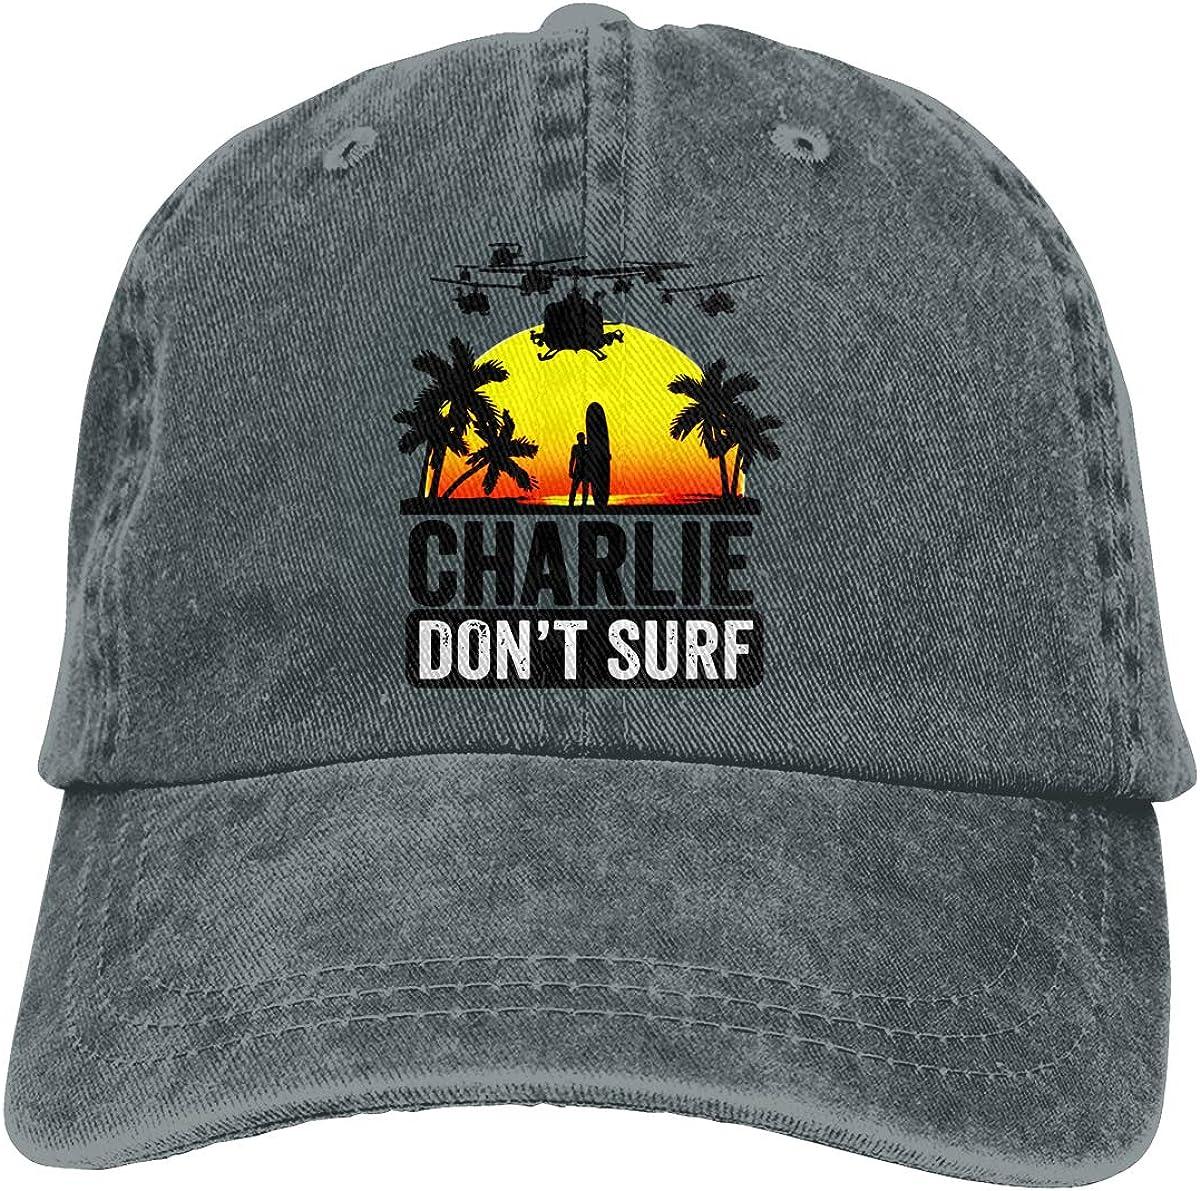 Charlie Dont SURF Fashion Unisex Washed Cap Adjustable Dads Denim Stetson Hat